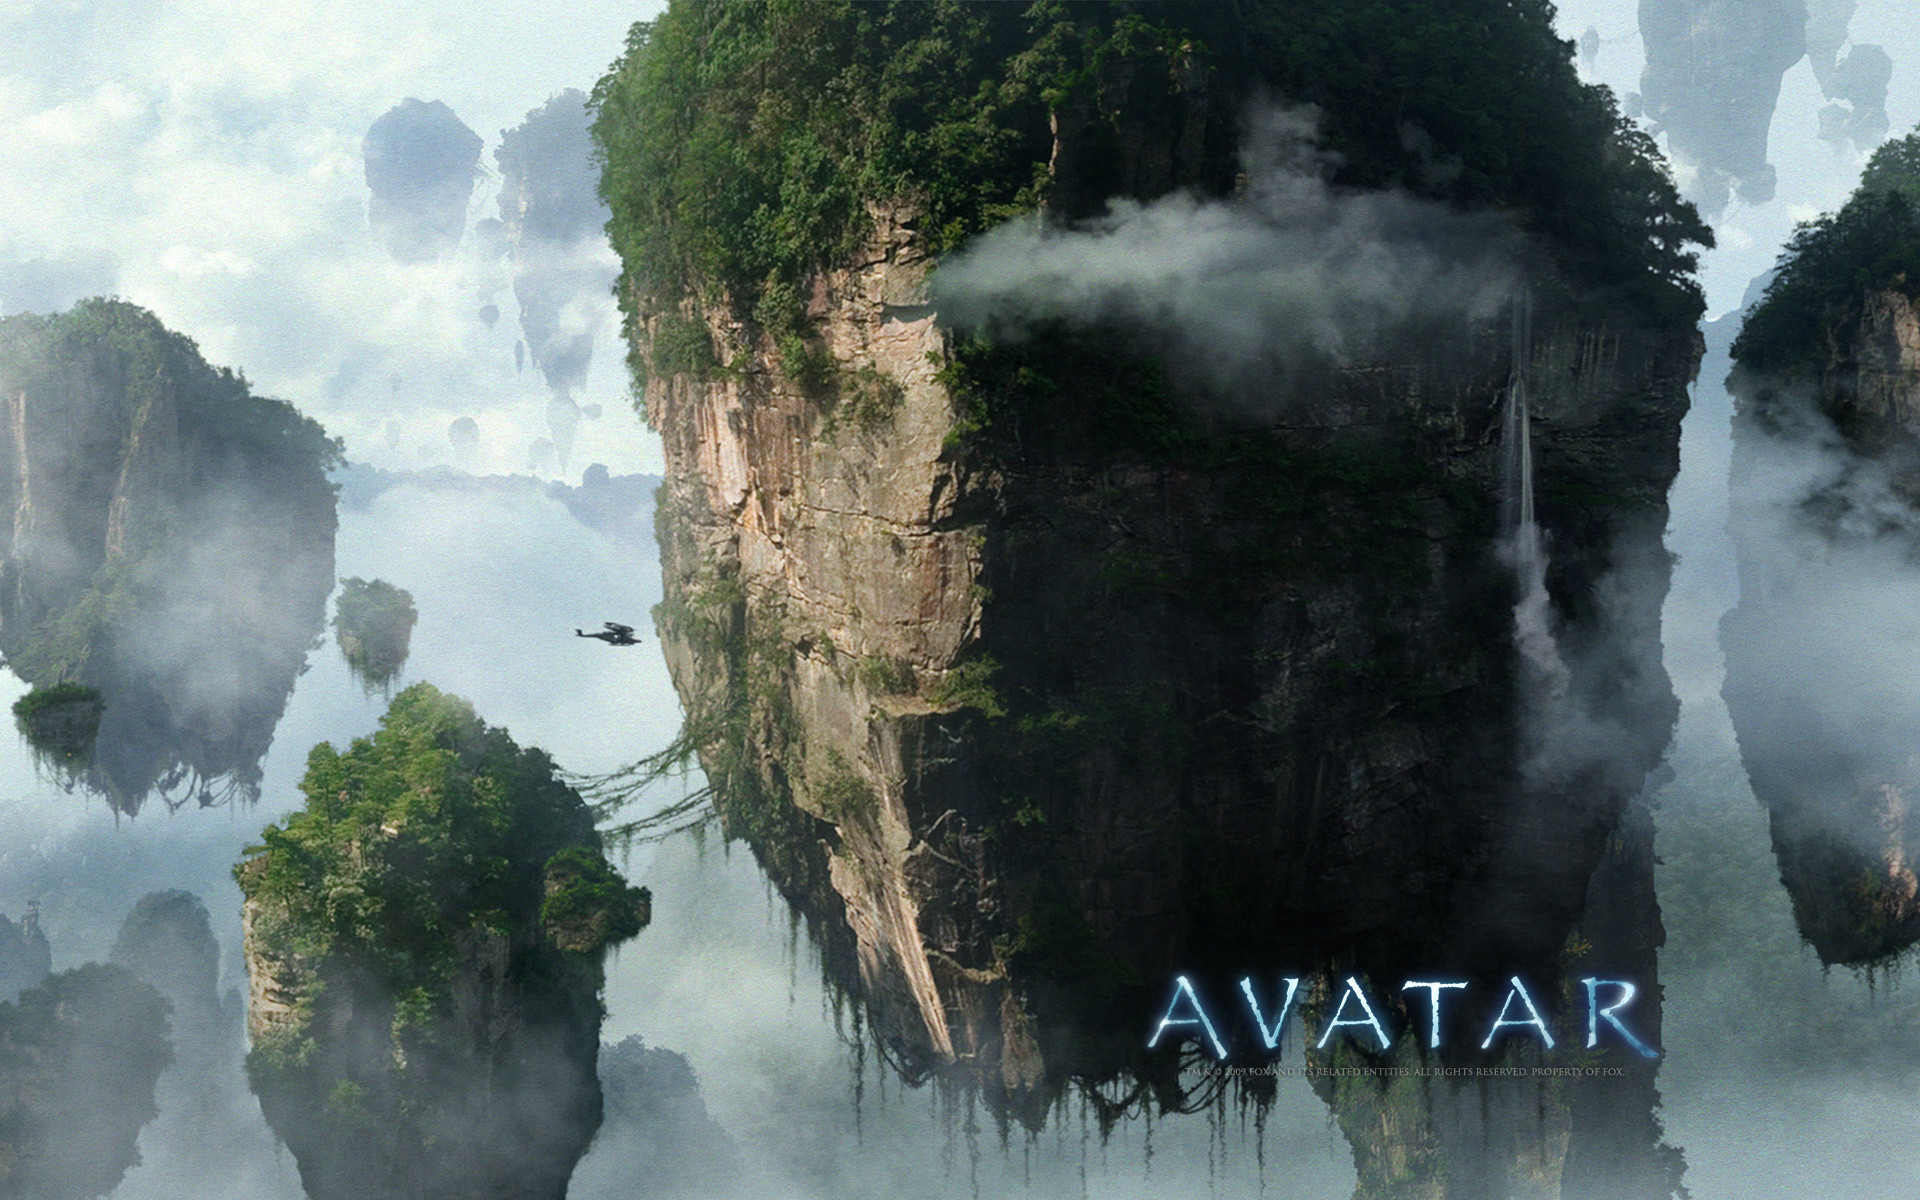 Avatar HD Wallpaper 6 @1920*1200